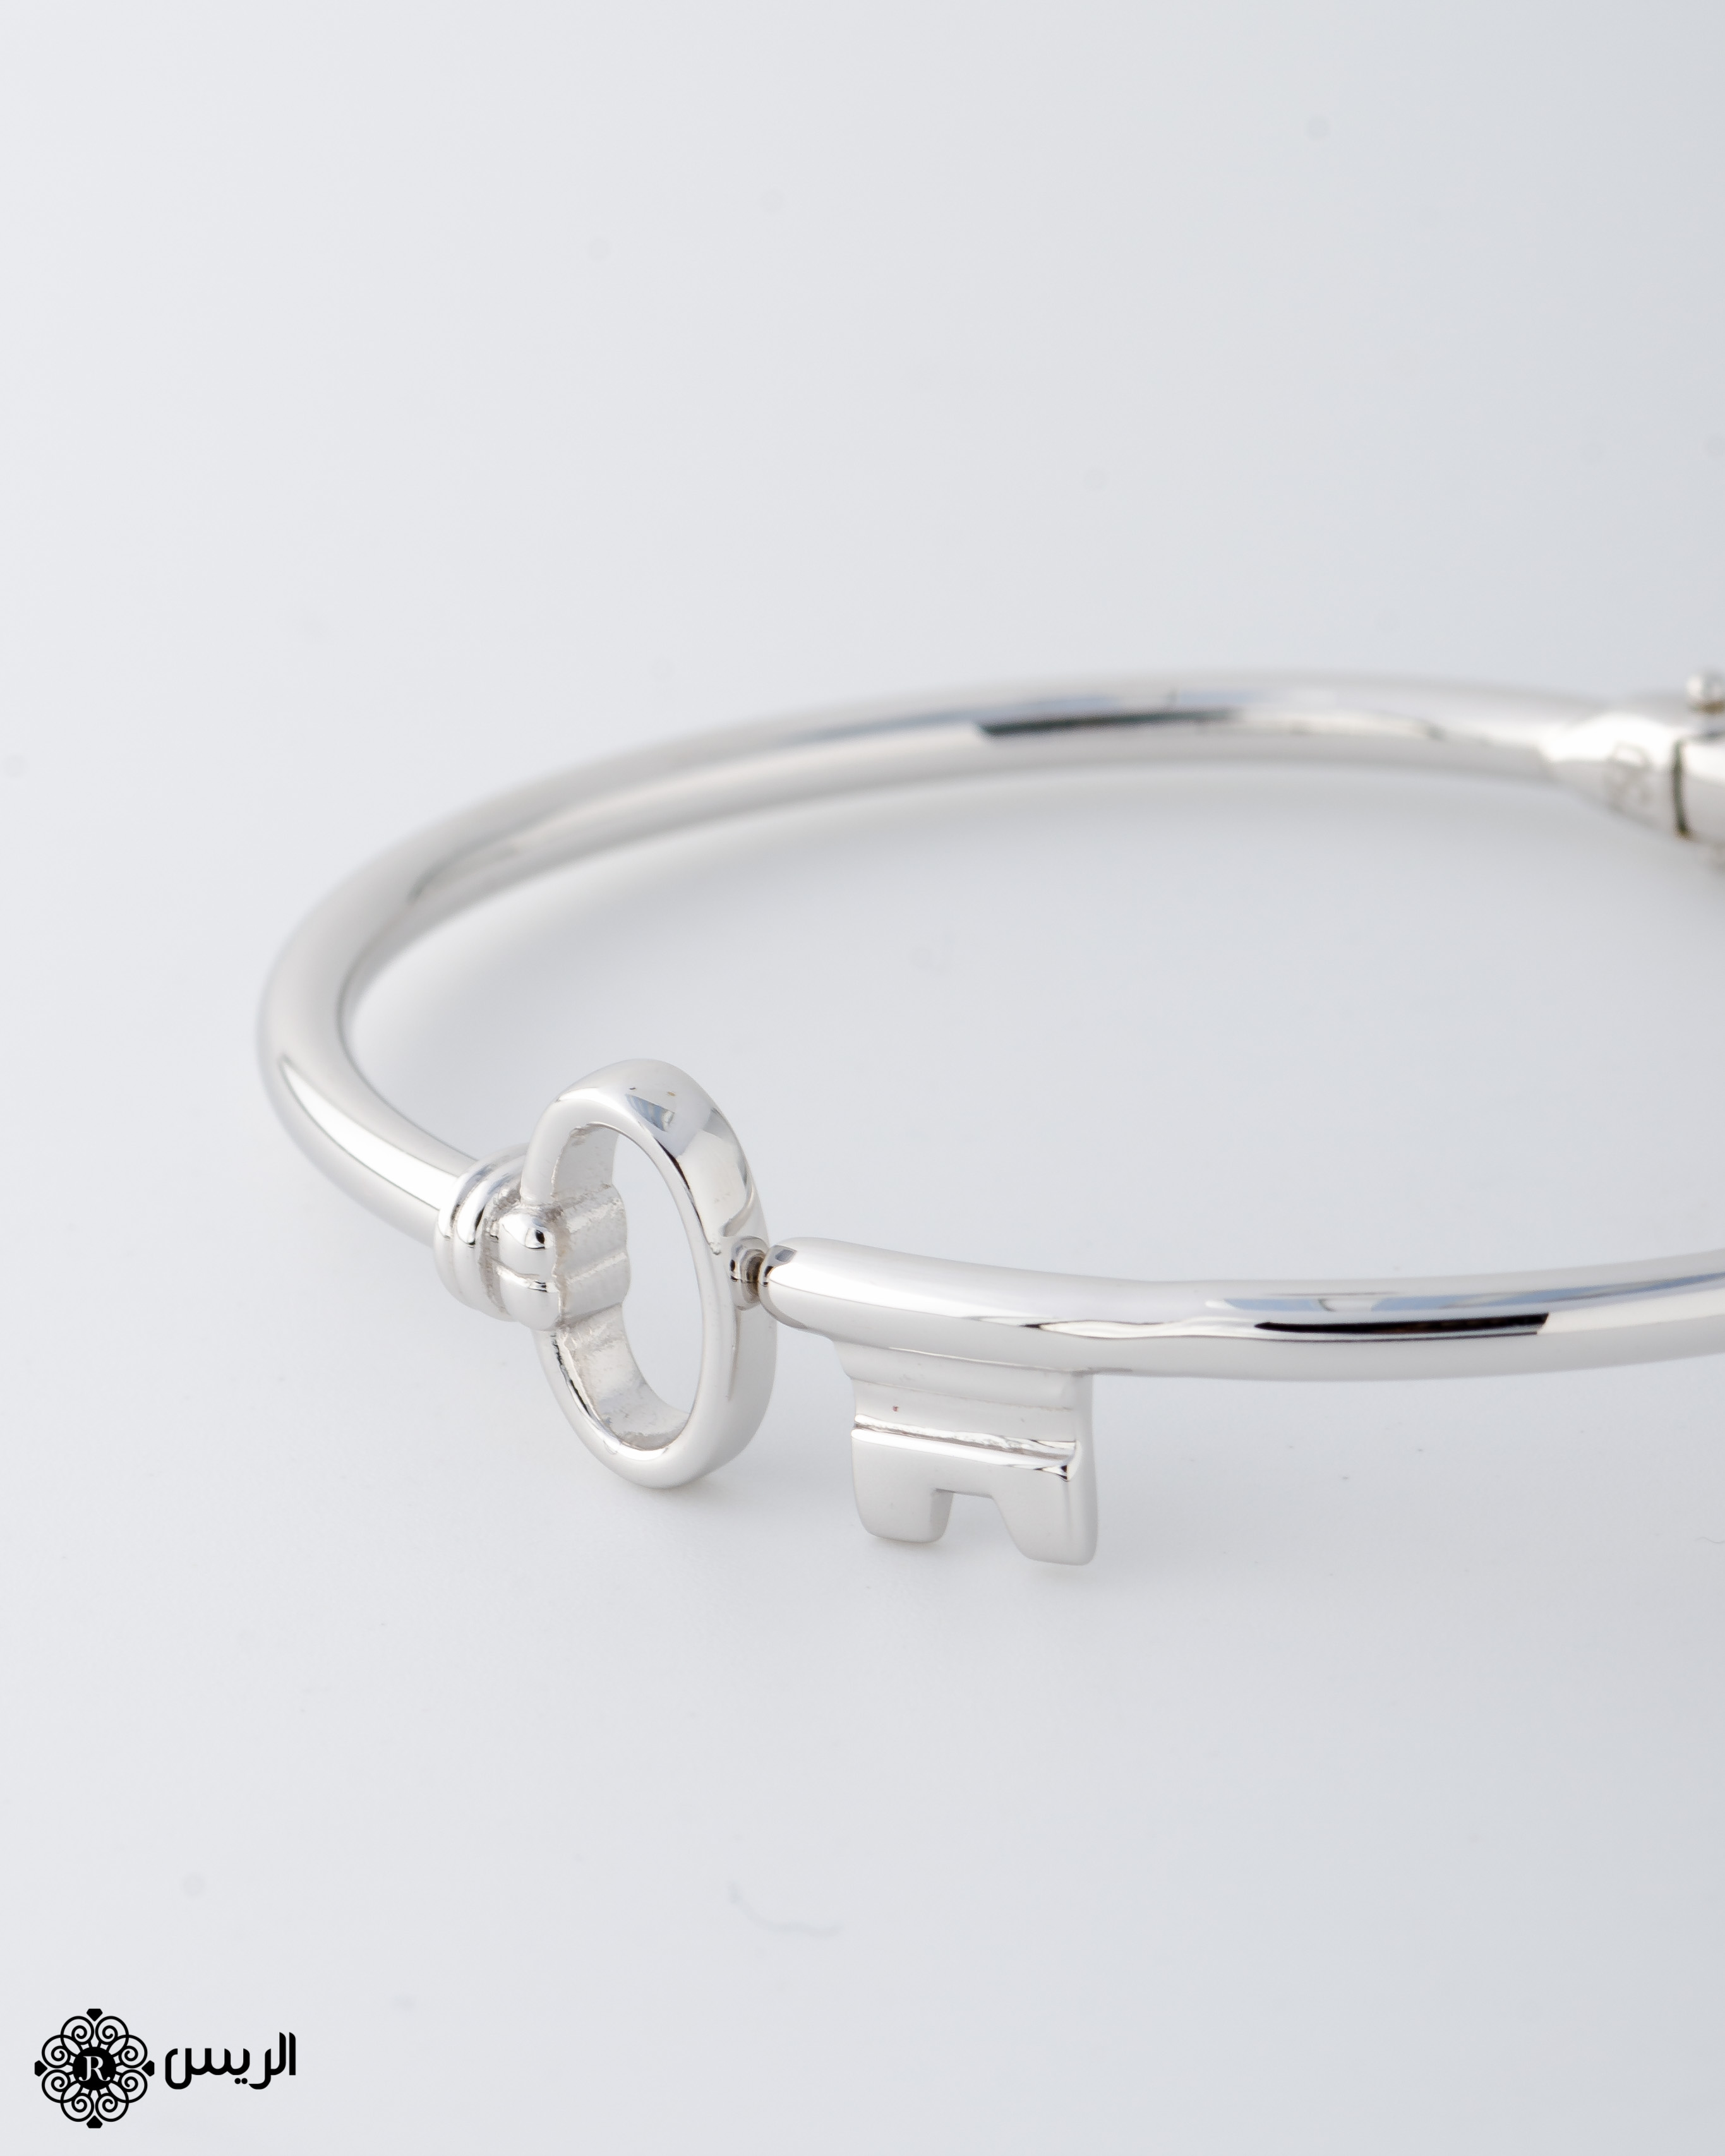 Raies jewelry Bangle Key Casual Design إسورة مفتاح تصميم سبور الريس للمجوهرات